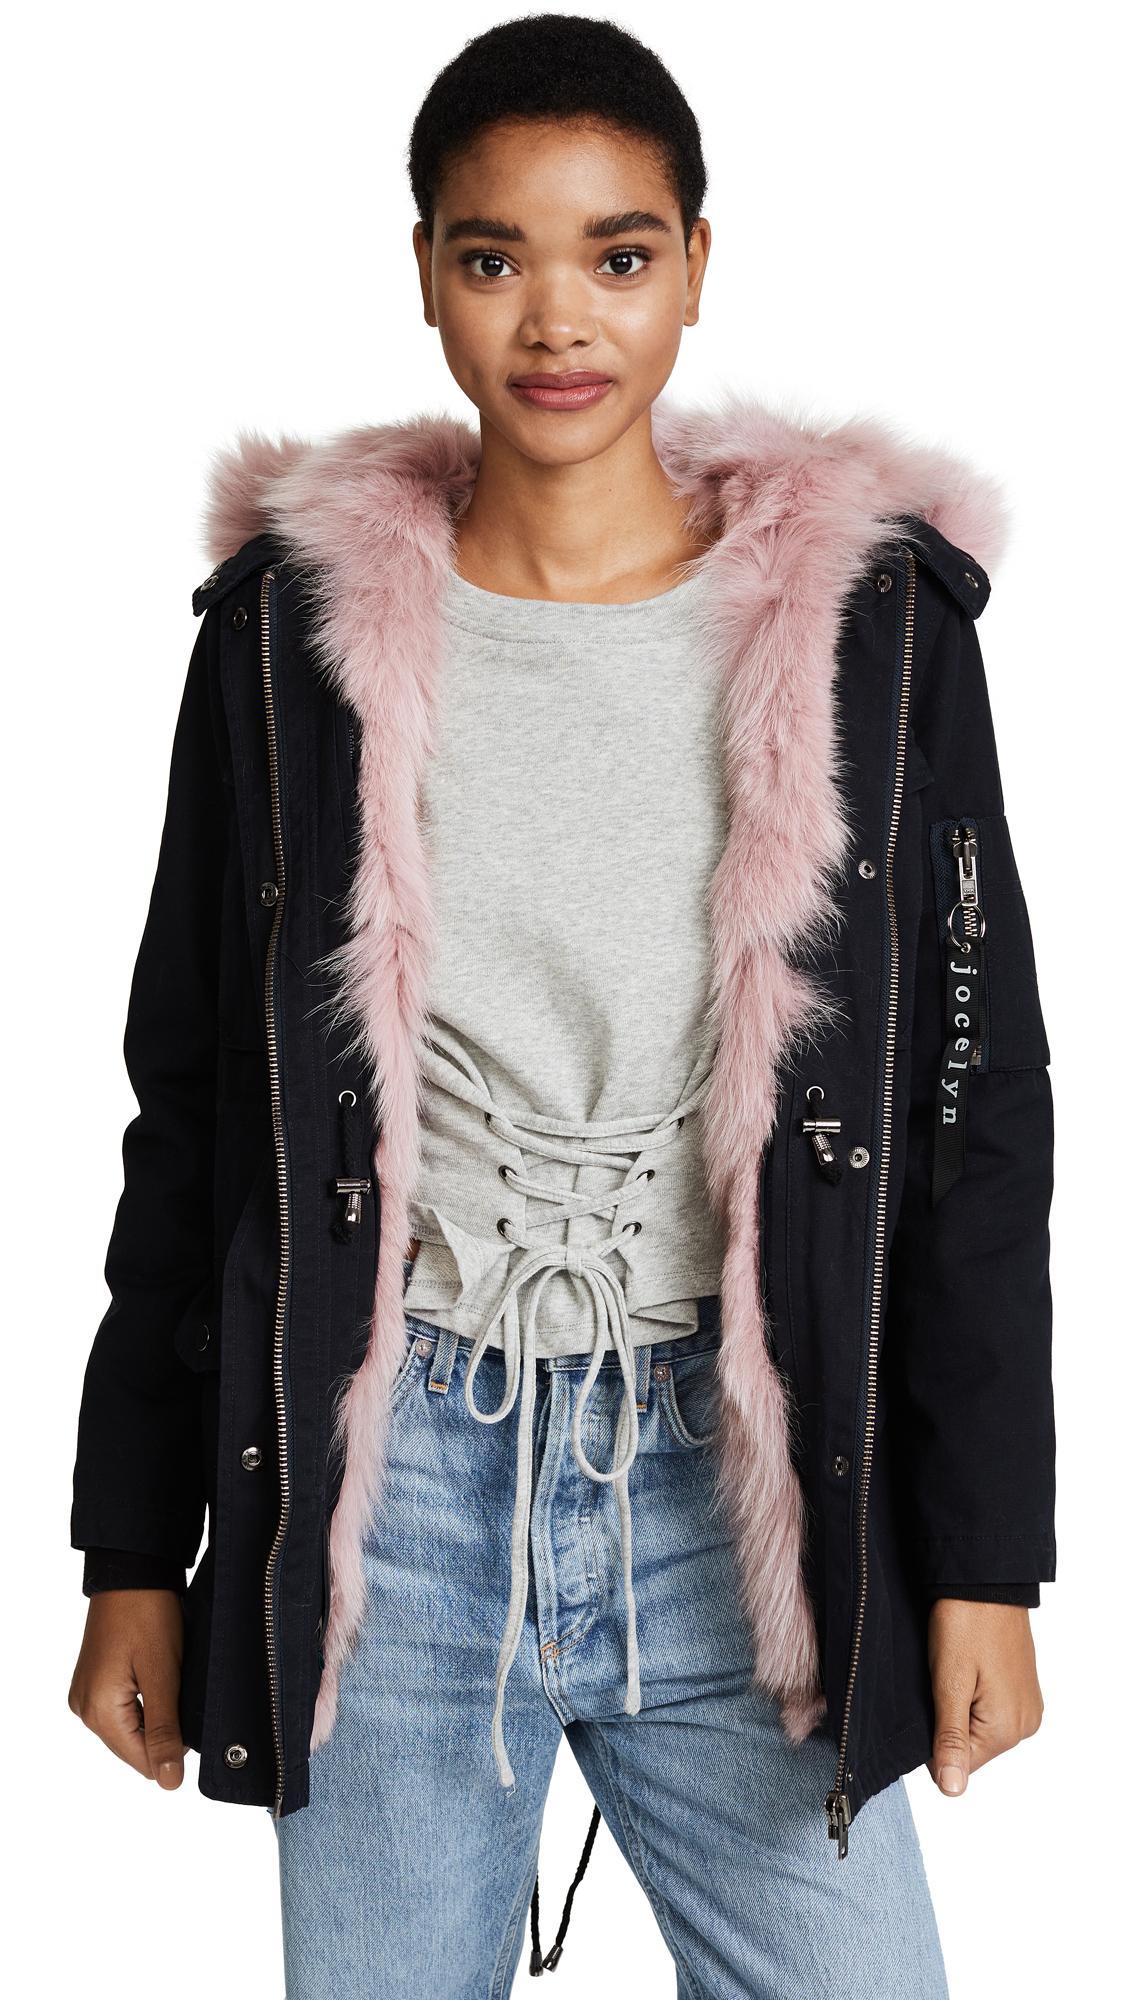 Jocelyn Cargo Coat With Fur Lining - Navy/Petal